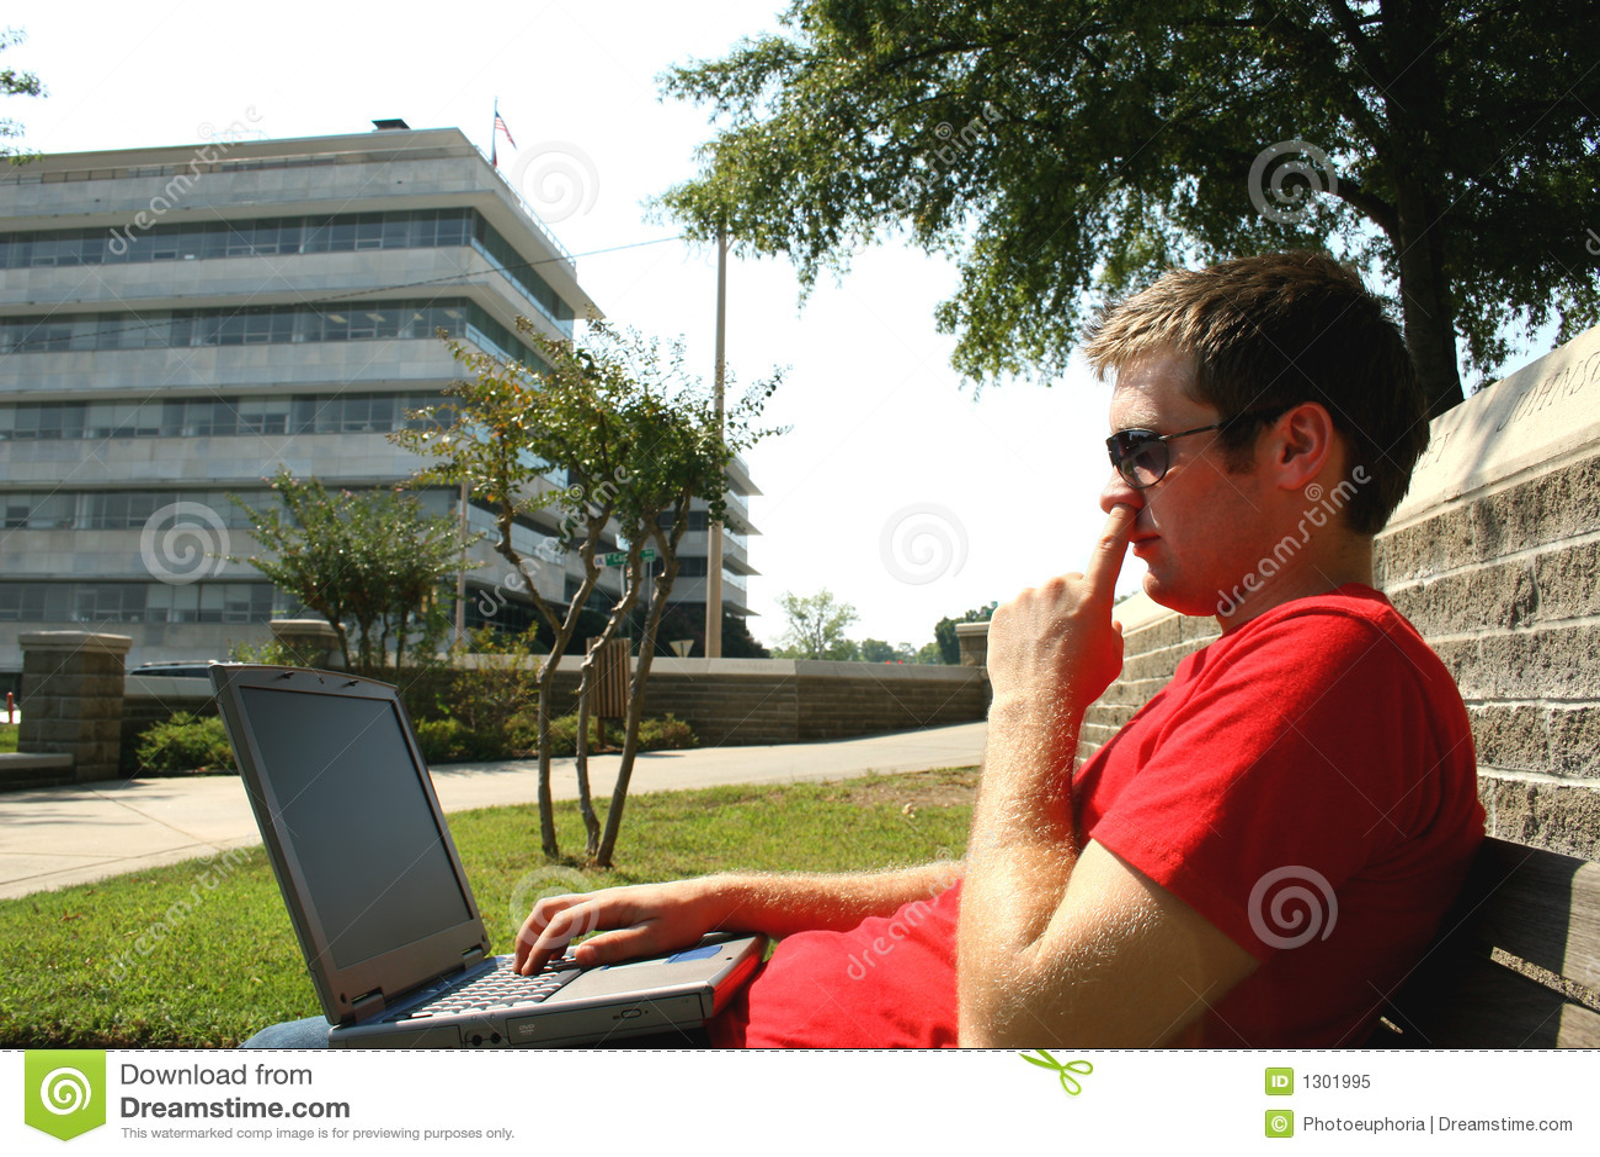 Man Picking His Nose Stock Image Image Of Outside Laptop